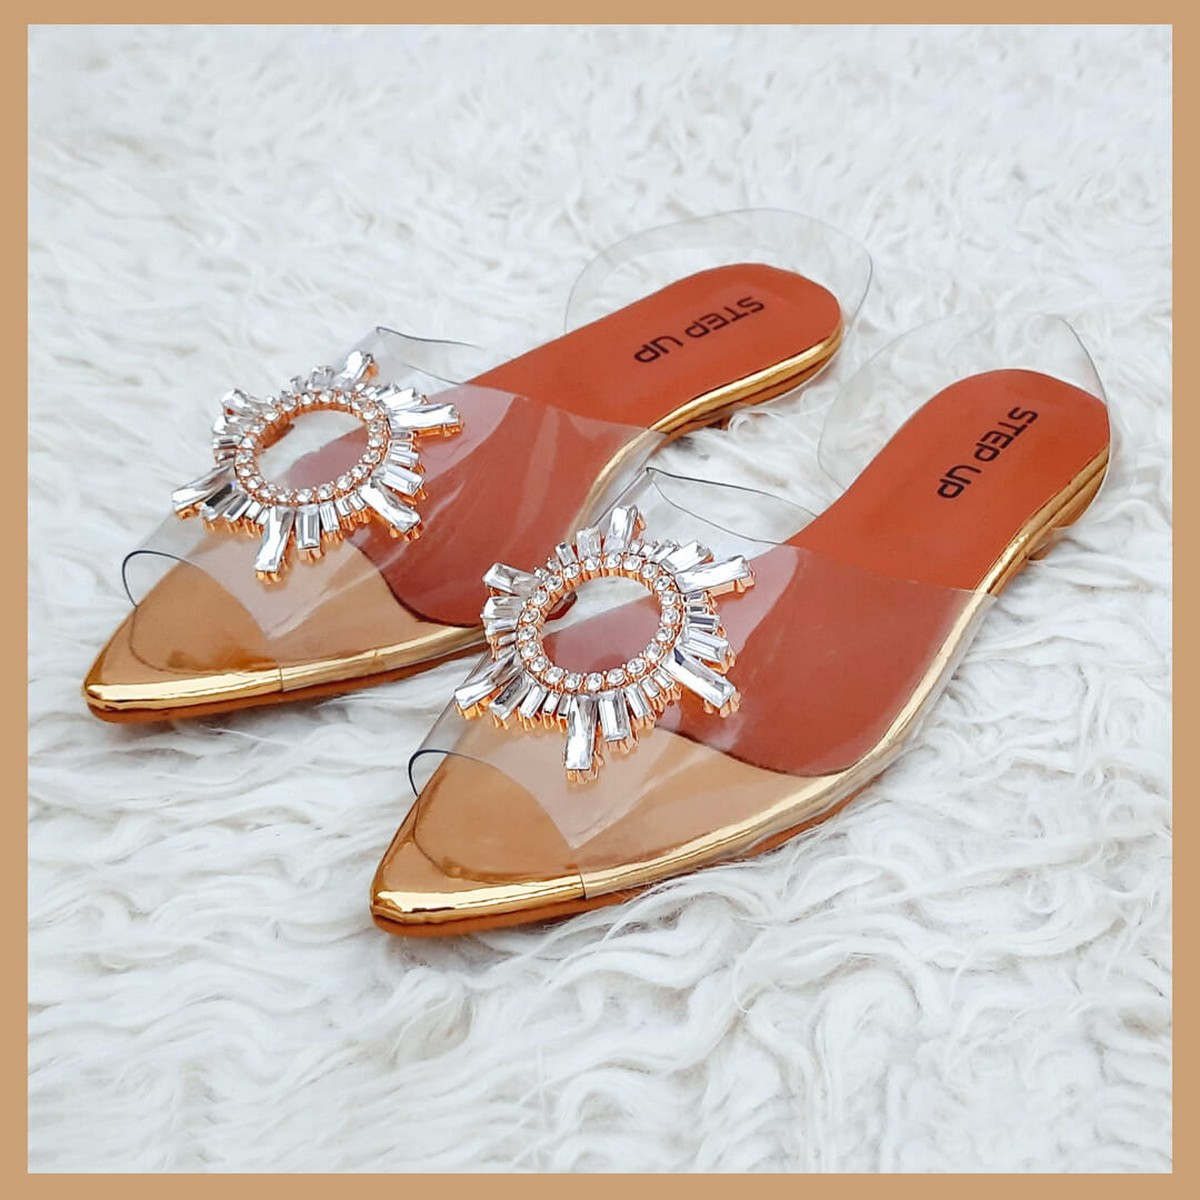 Women's Transparent Shoes  Flat Golden Comfortable Shoes  Step Up